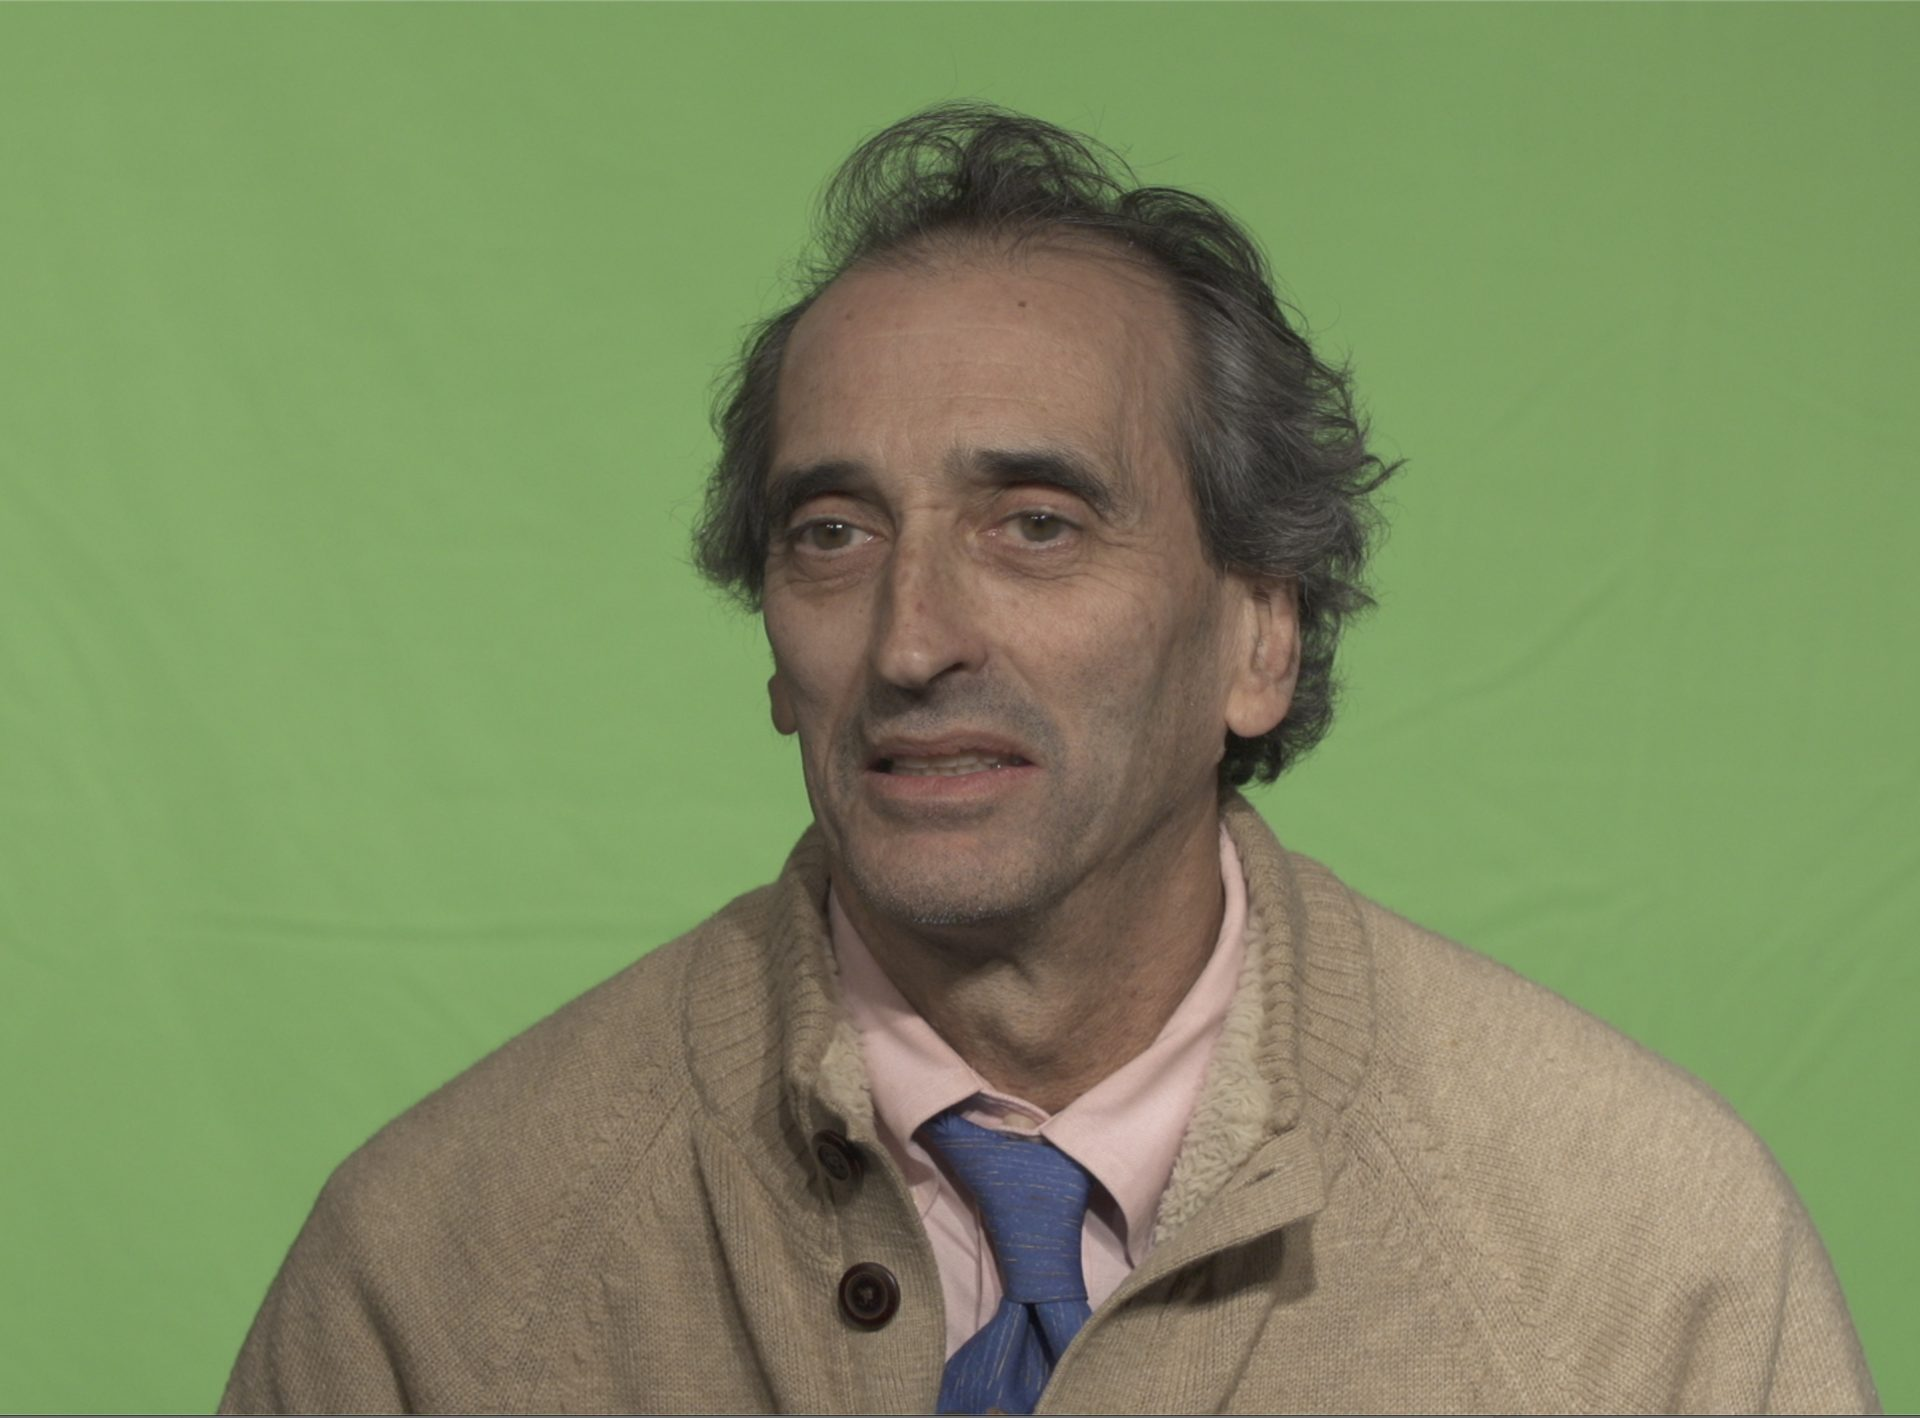 Paul Josephson